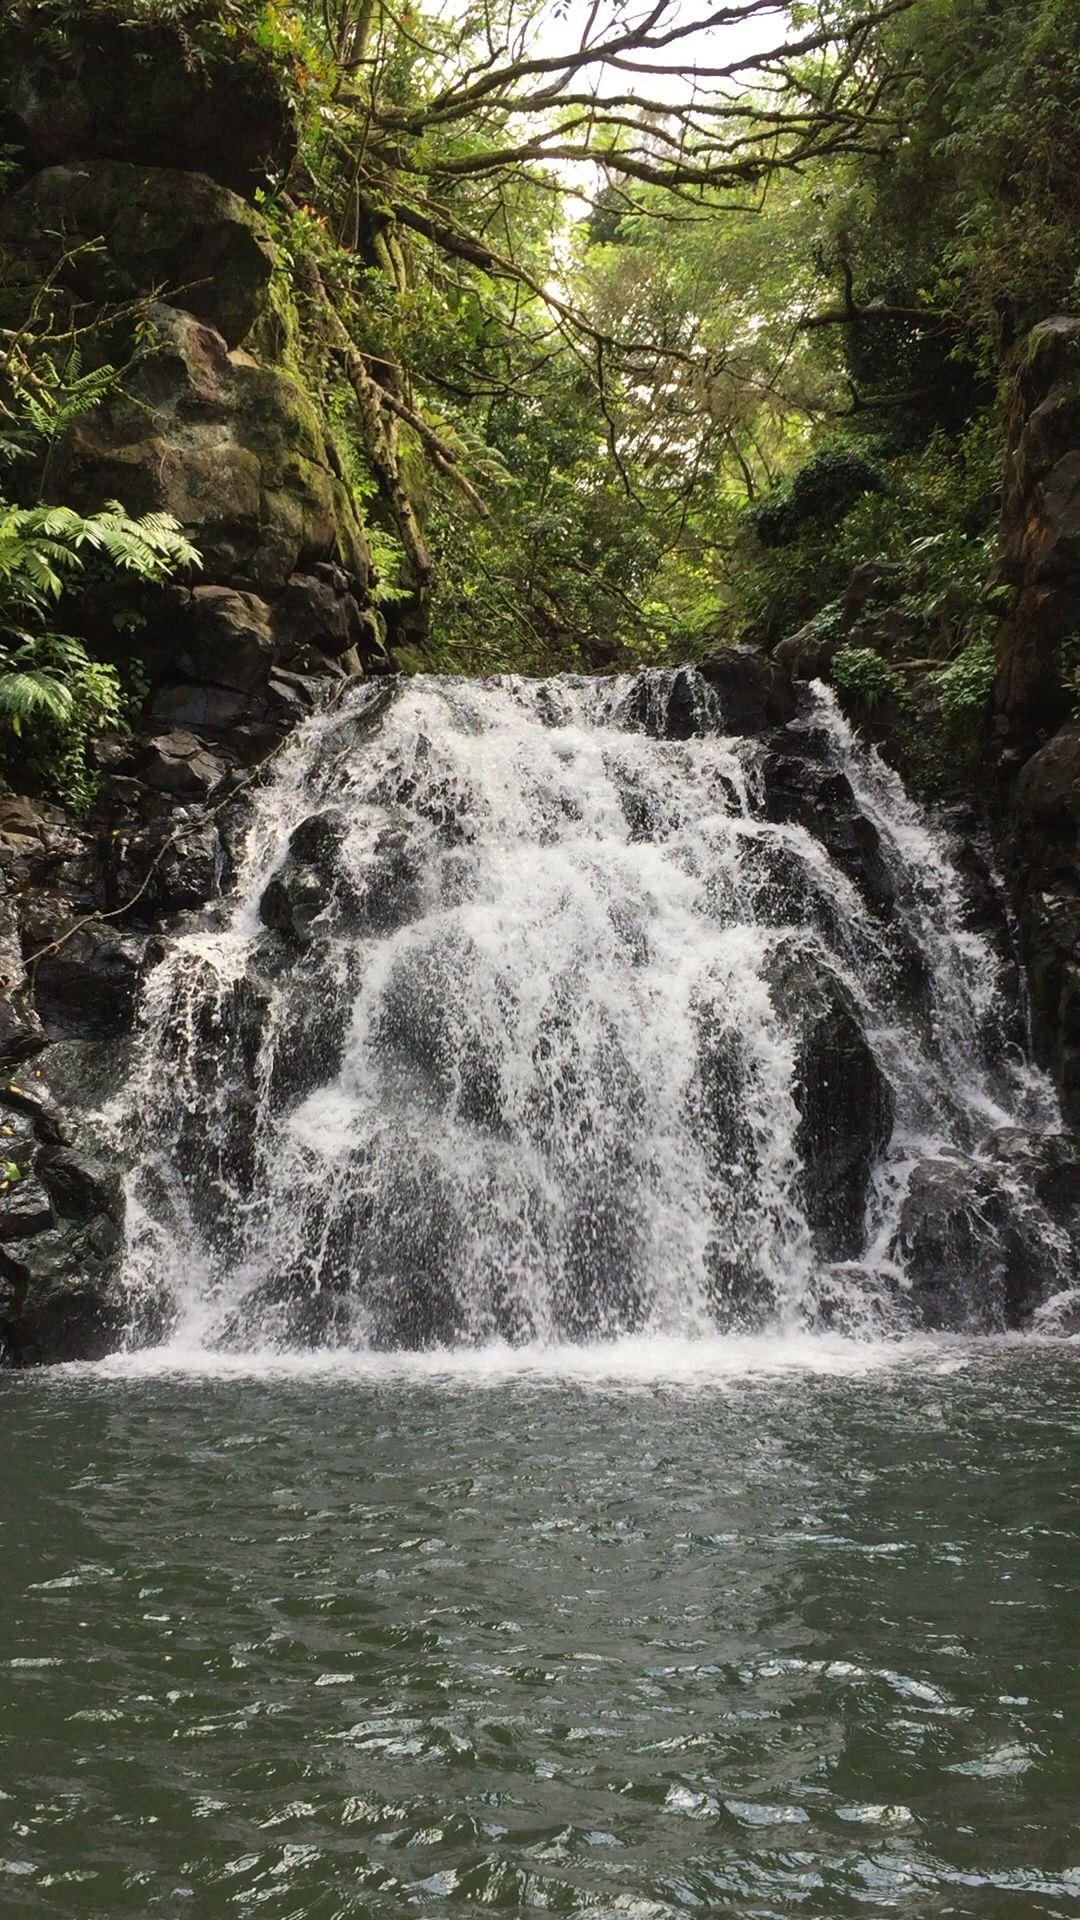 Ice pond in Kalihi valley Oahu Hawaii Waterfalls Waterfall 1080x1920